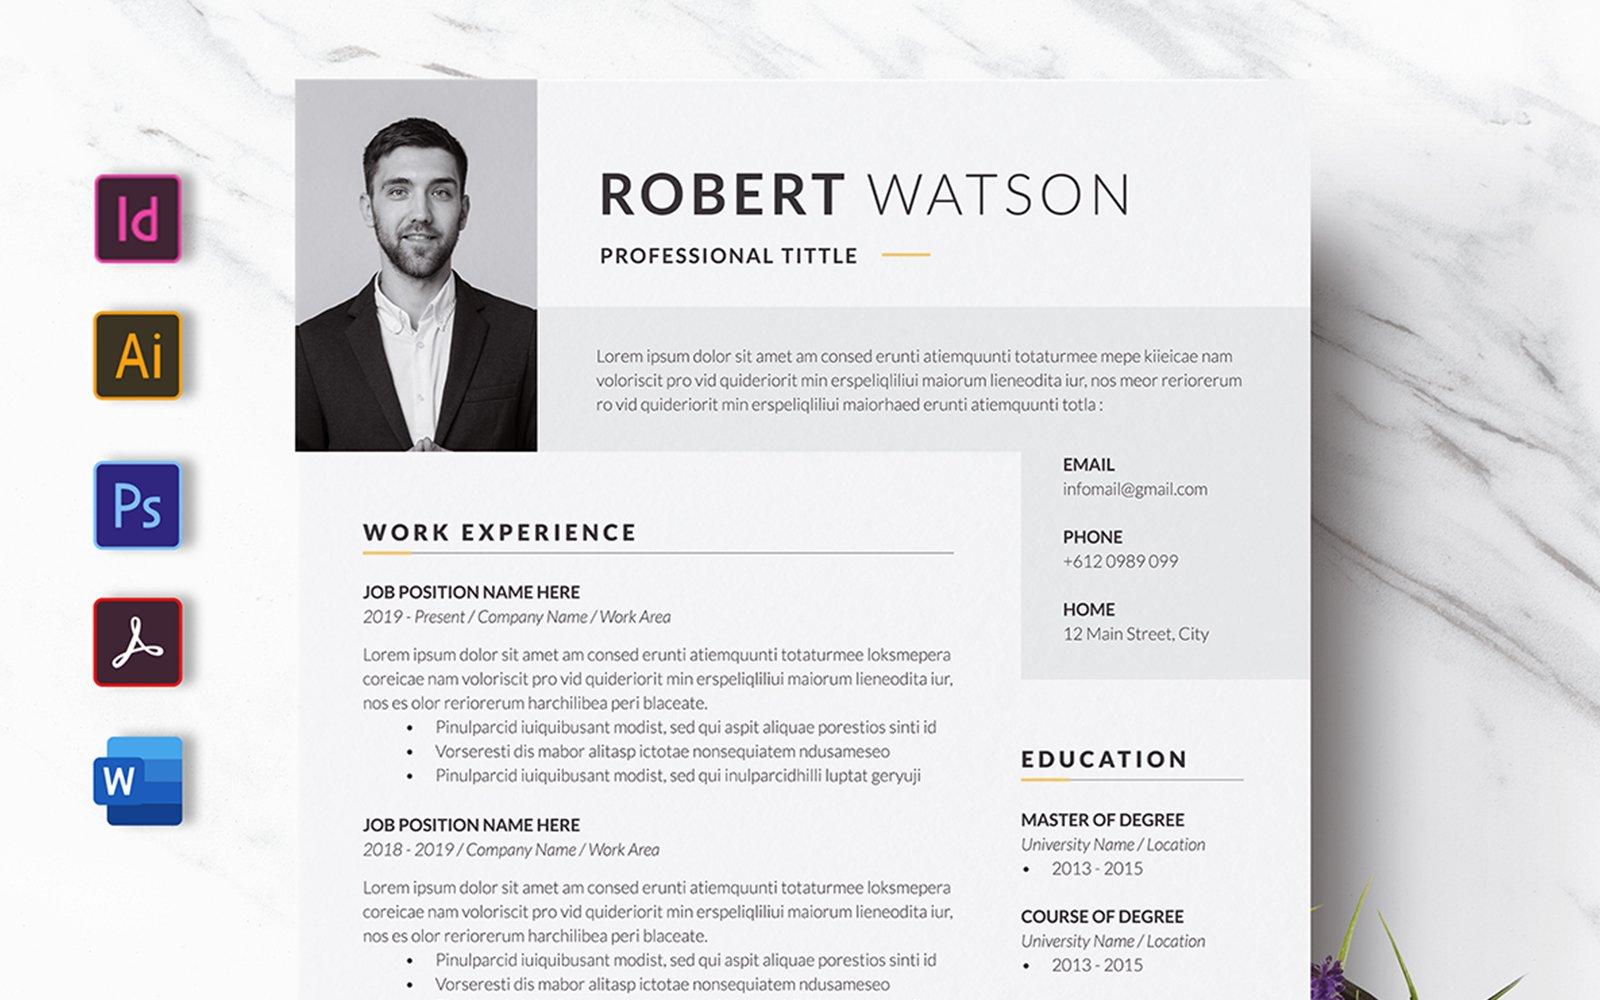 Monochrome CV Resume #126199